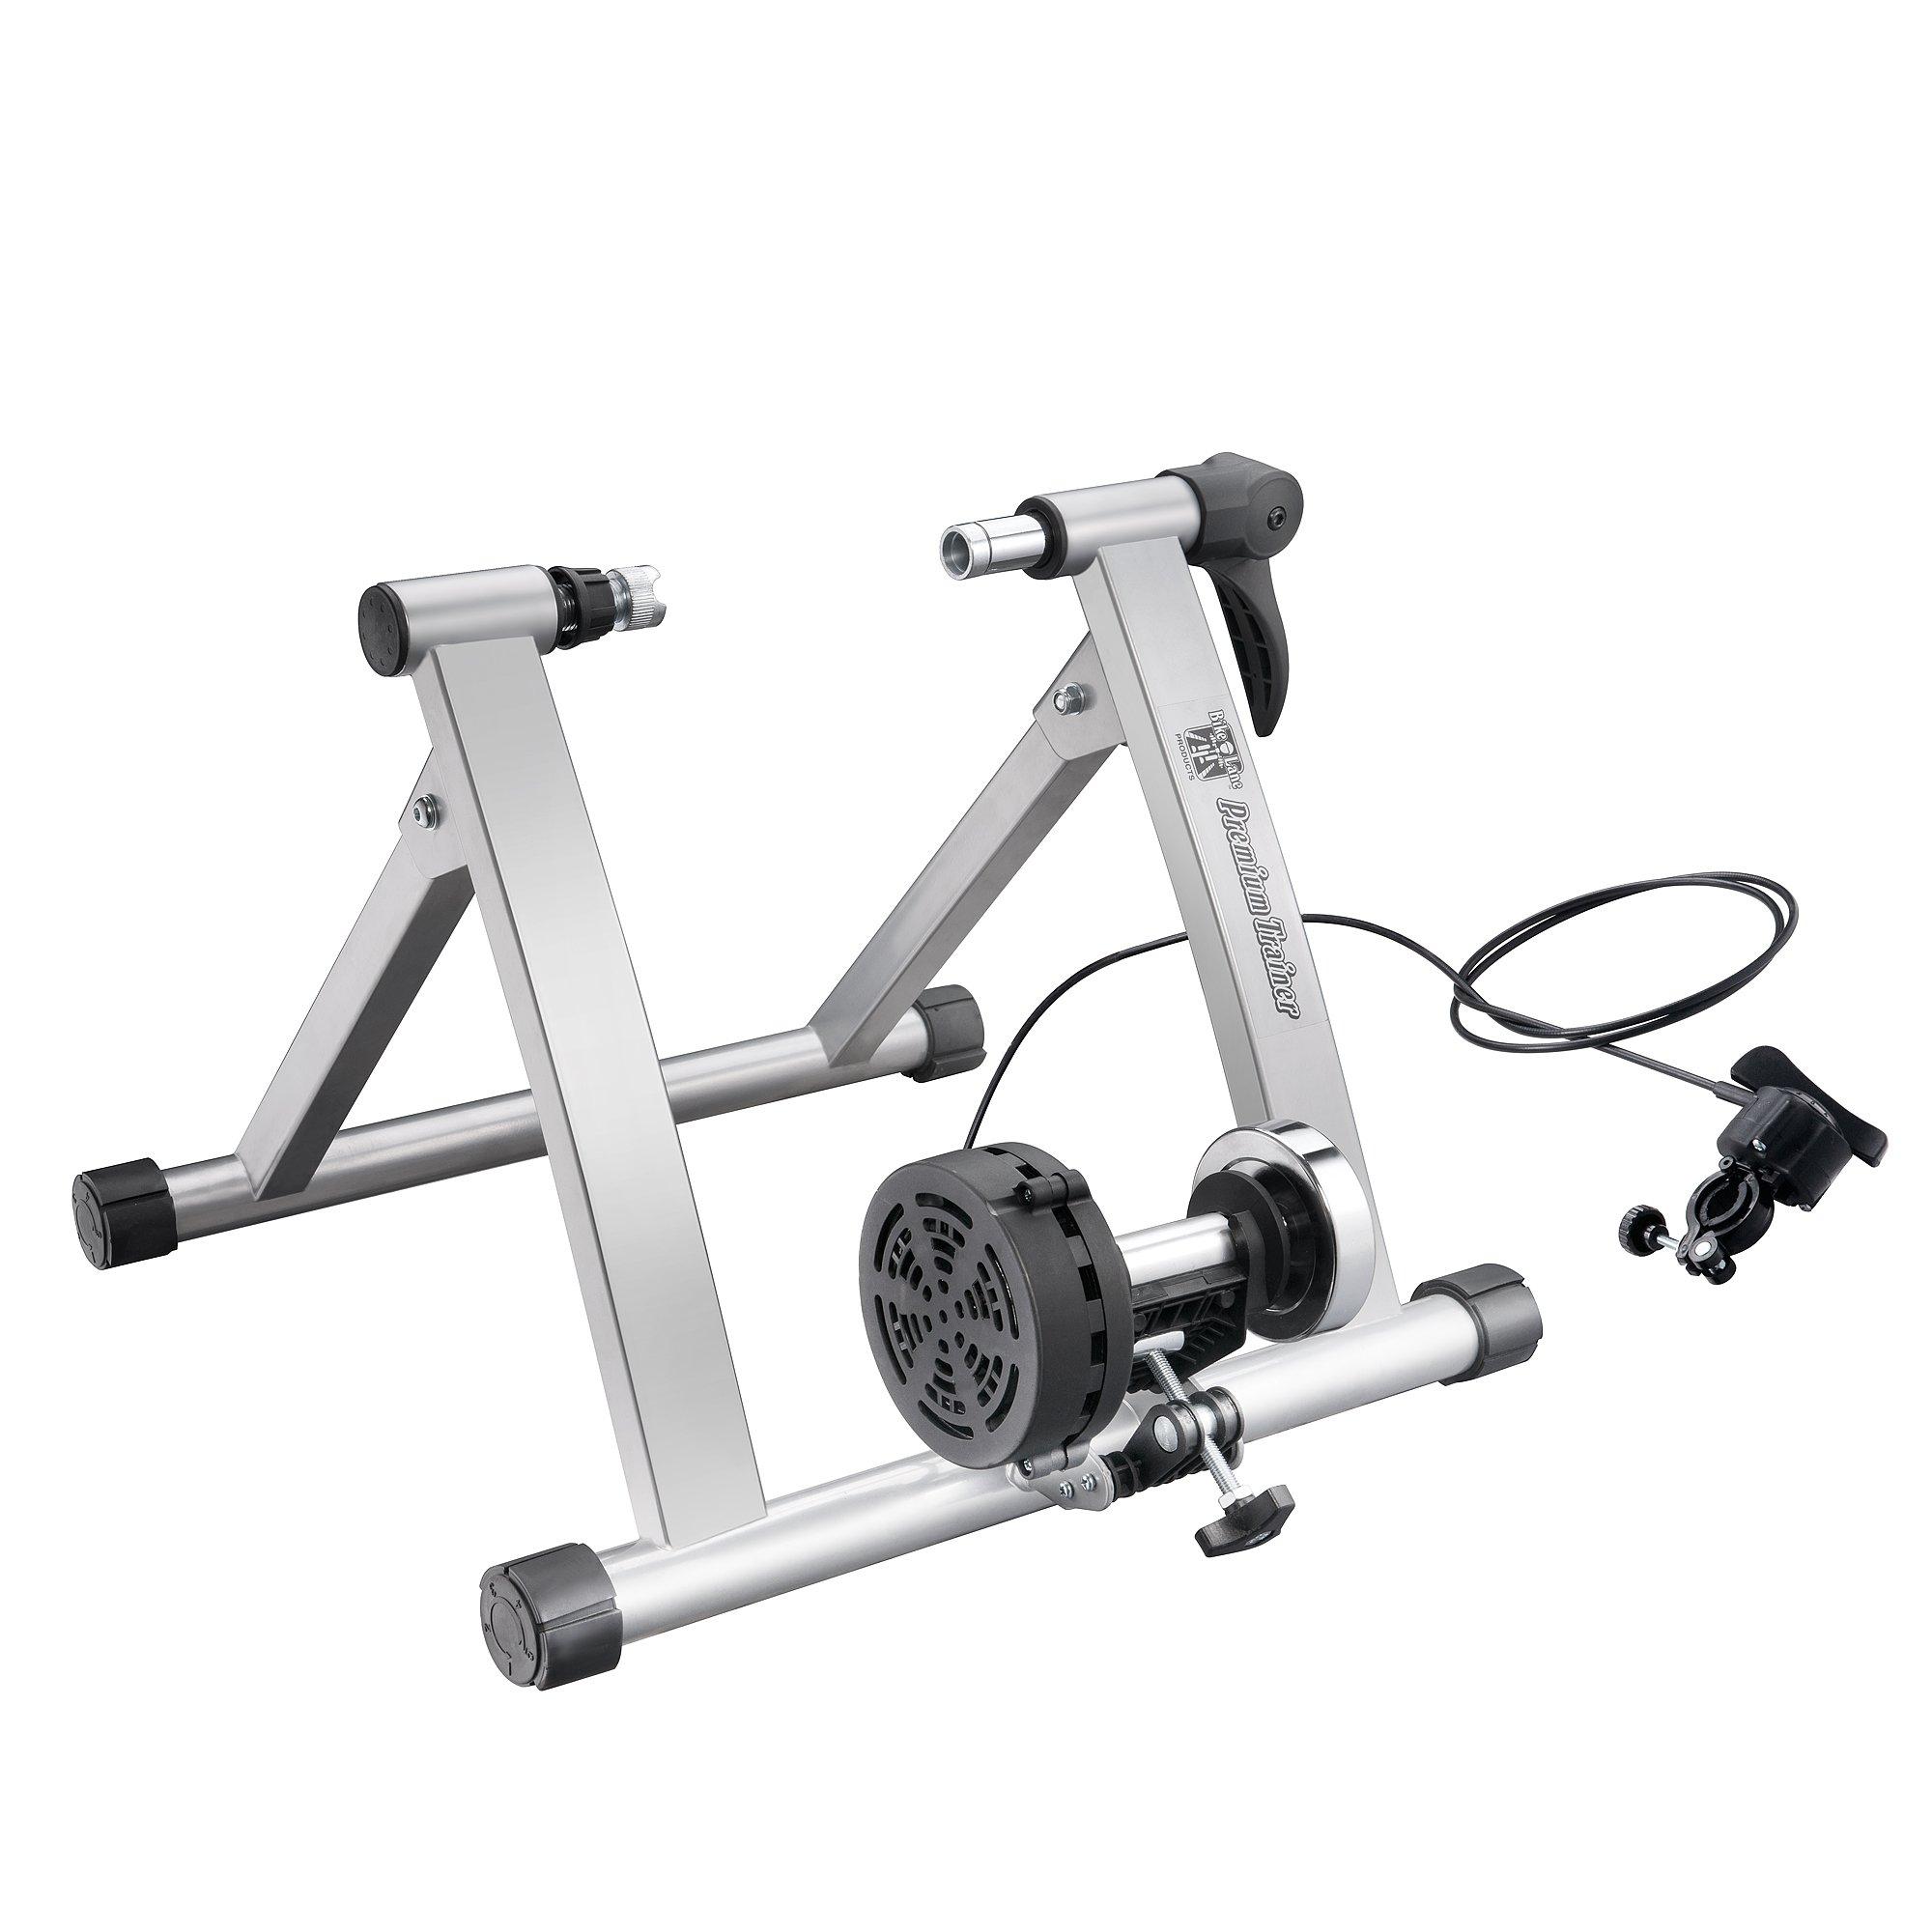 Bike Lane Premium Trainer Bicycle Indoor Trainer Exercise Ride All Year